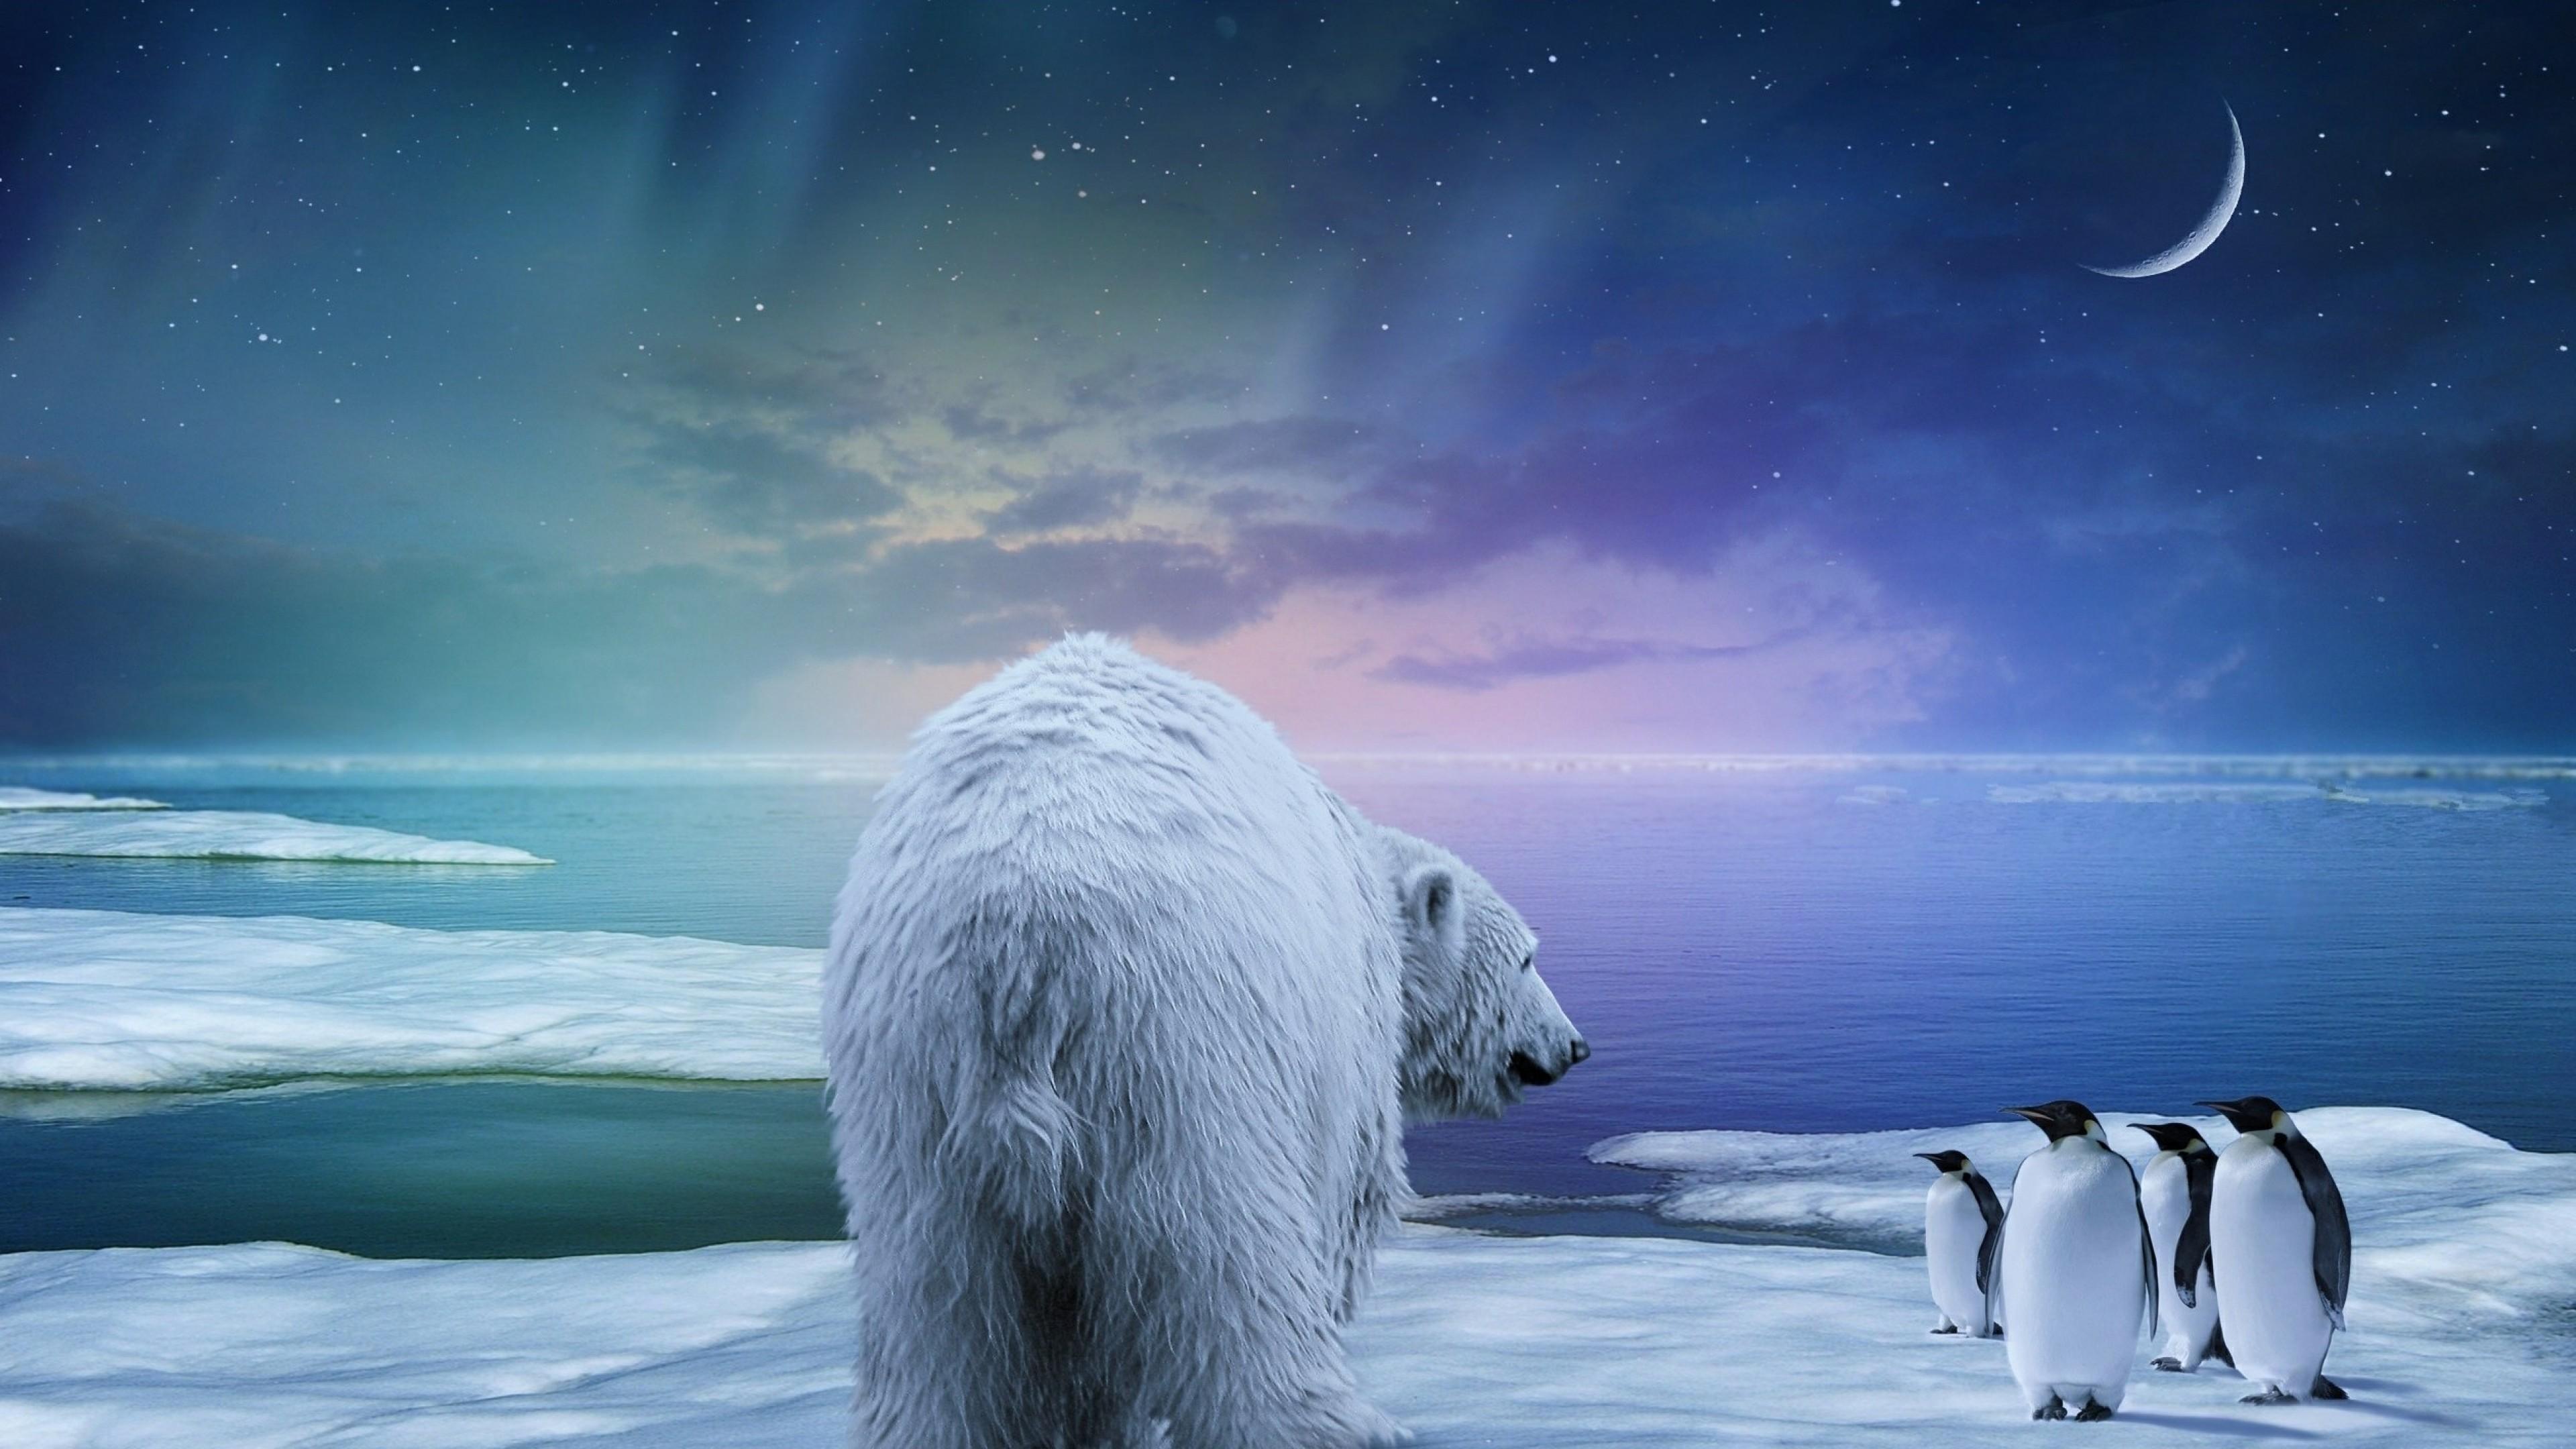 Wallpaper polar bear, penguin, northern lights